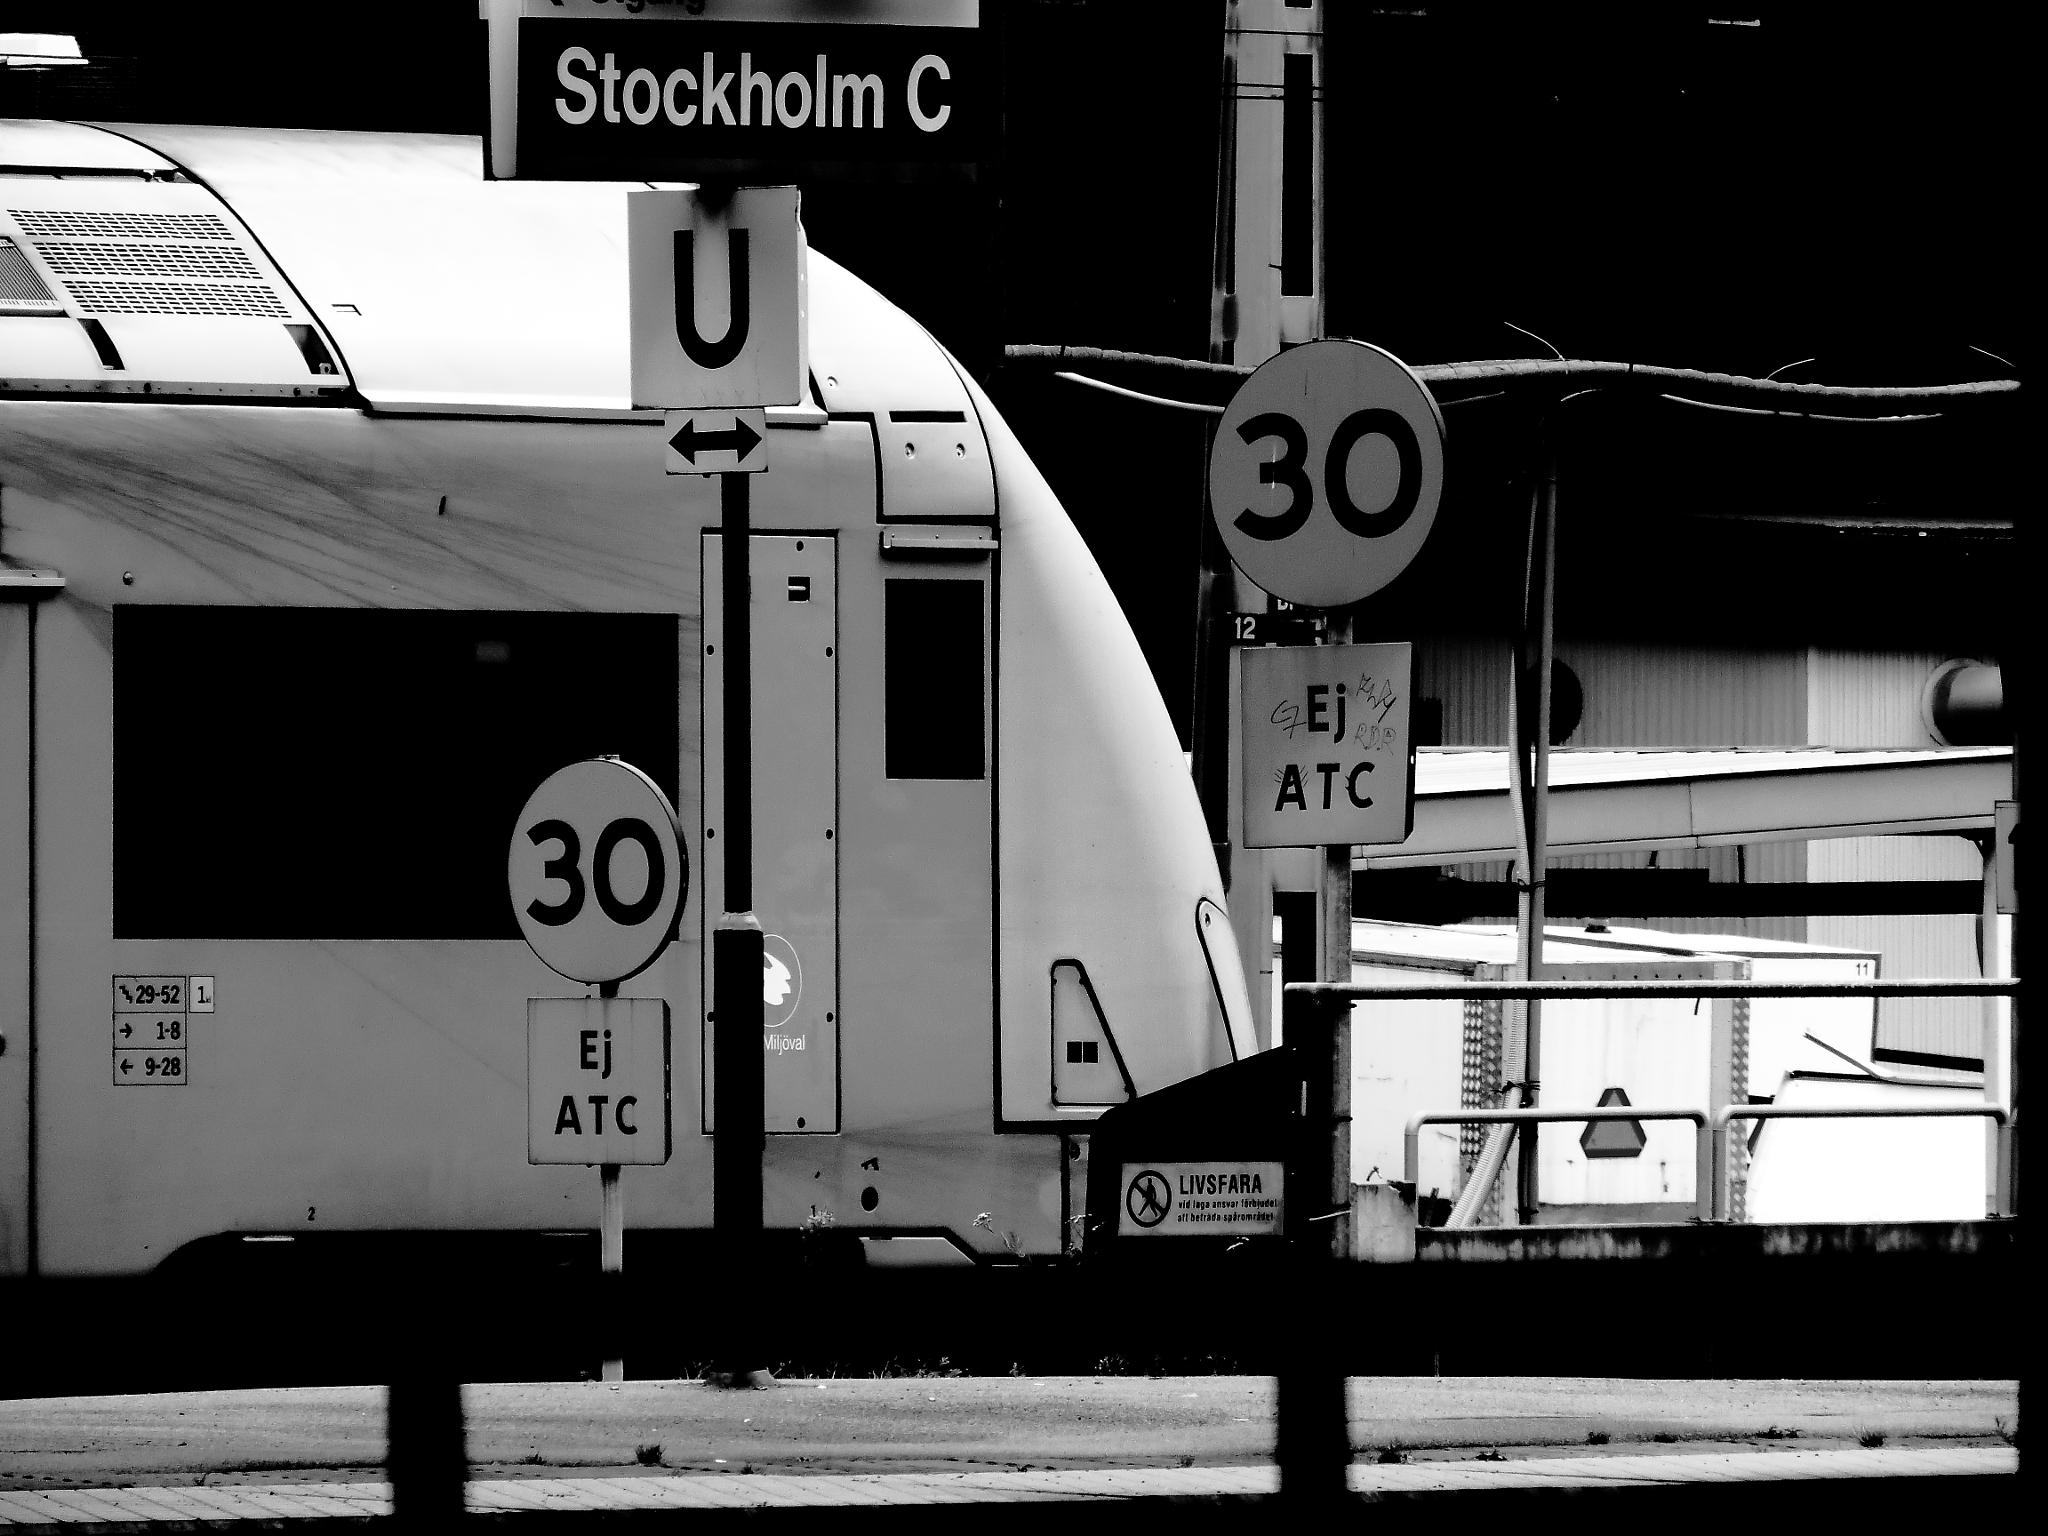 Stockholm C by Henrik Printz